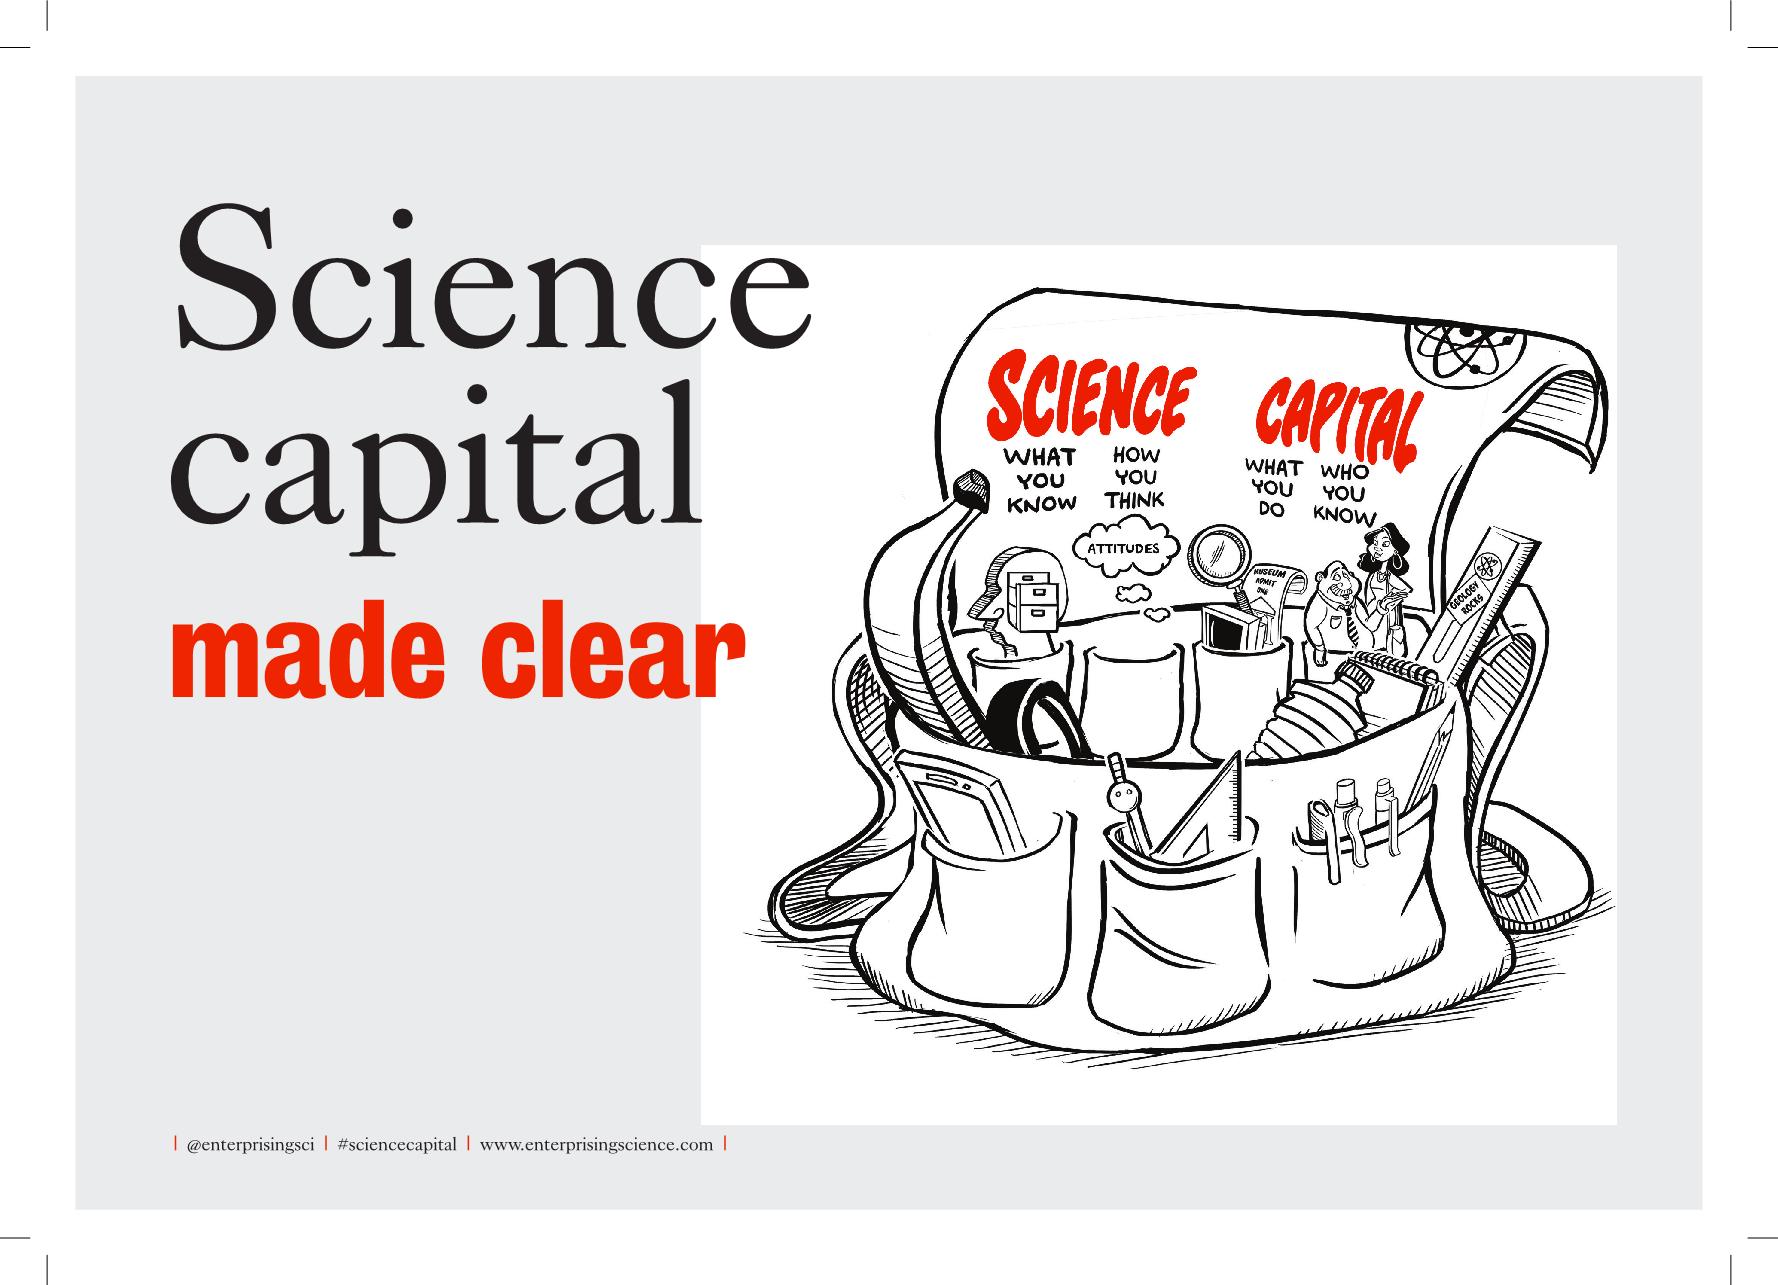 Science Capital